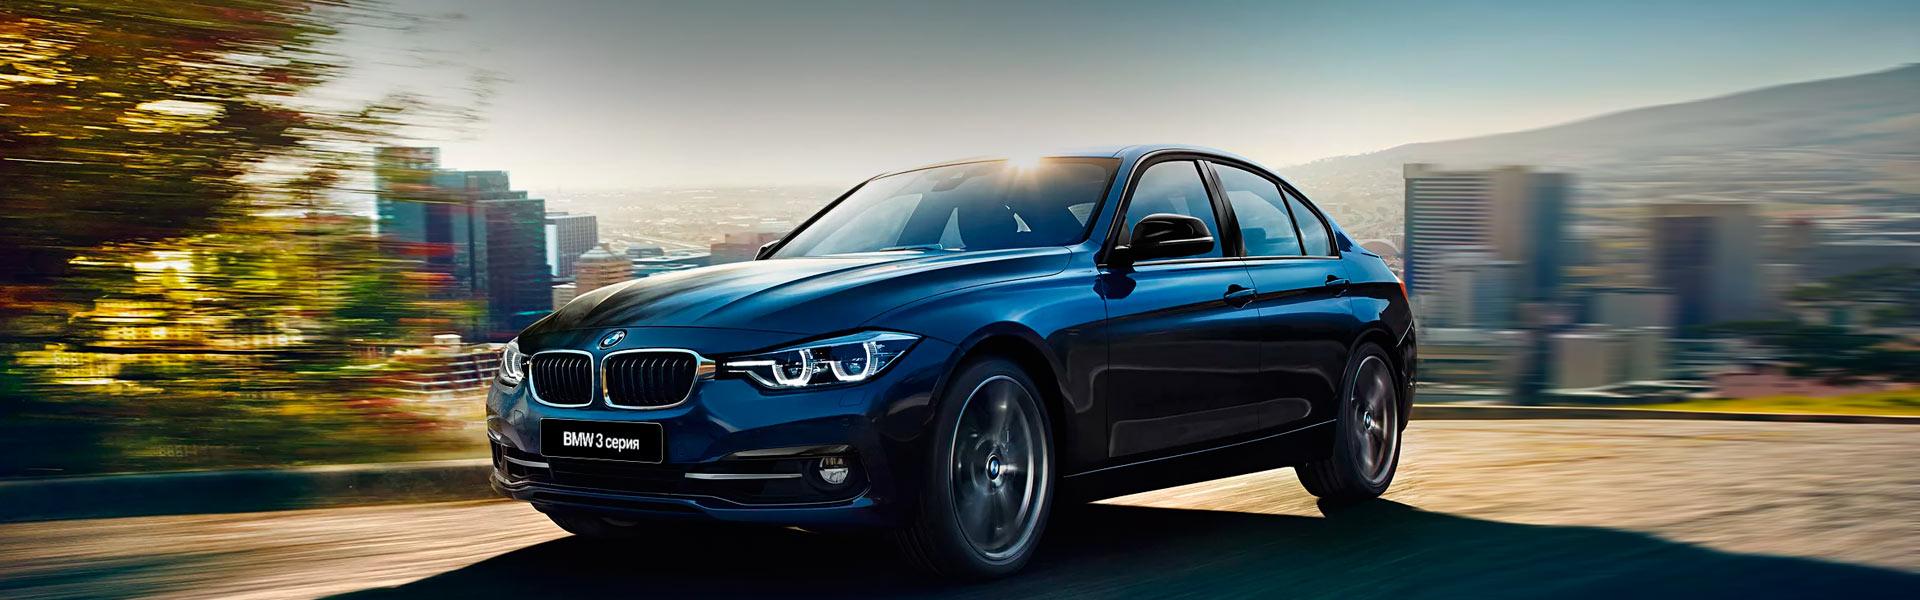 Замена радиатора BMW 3-series